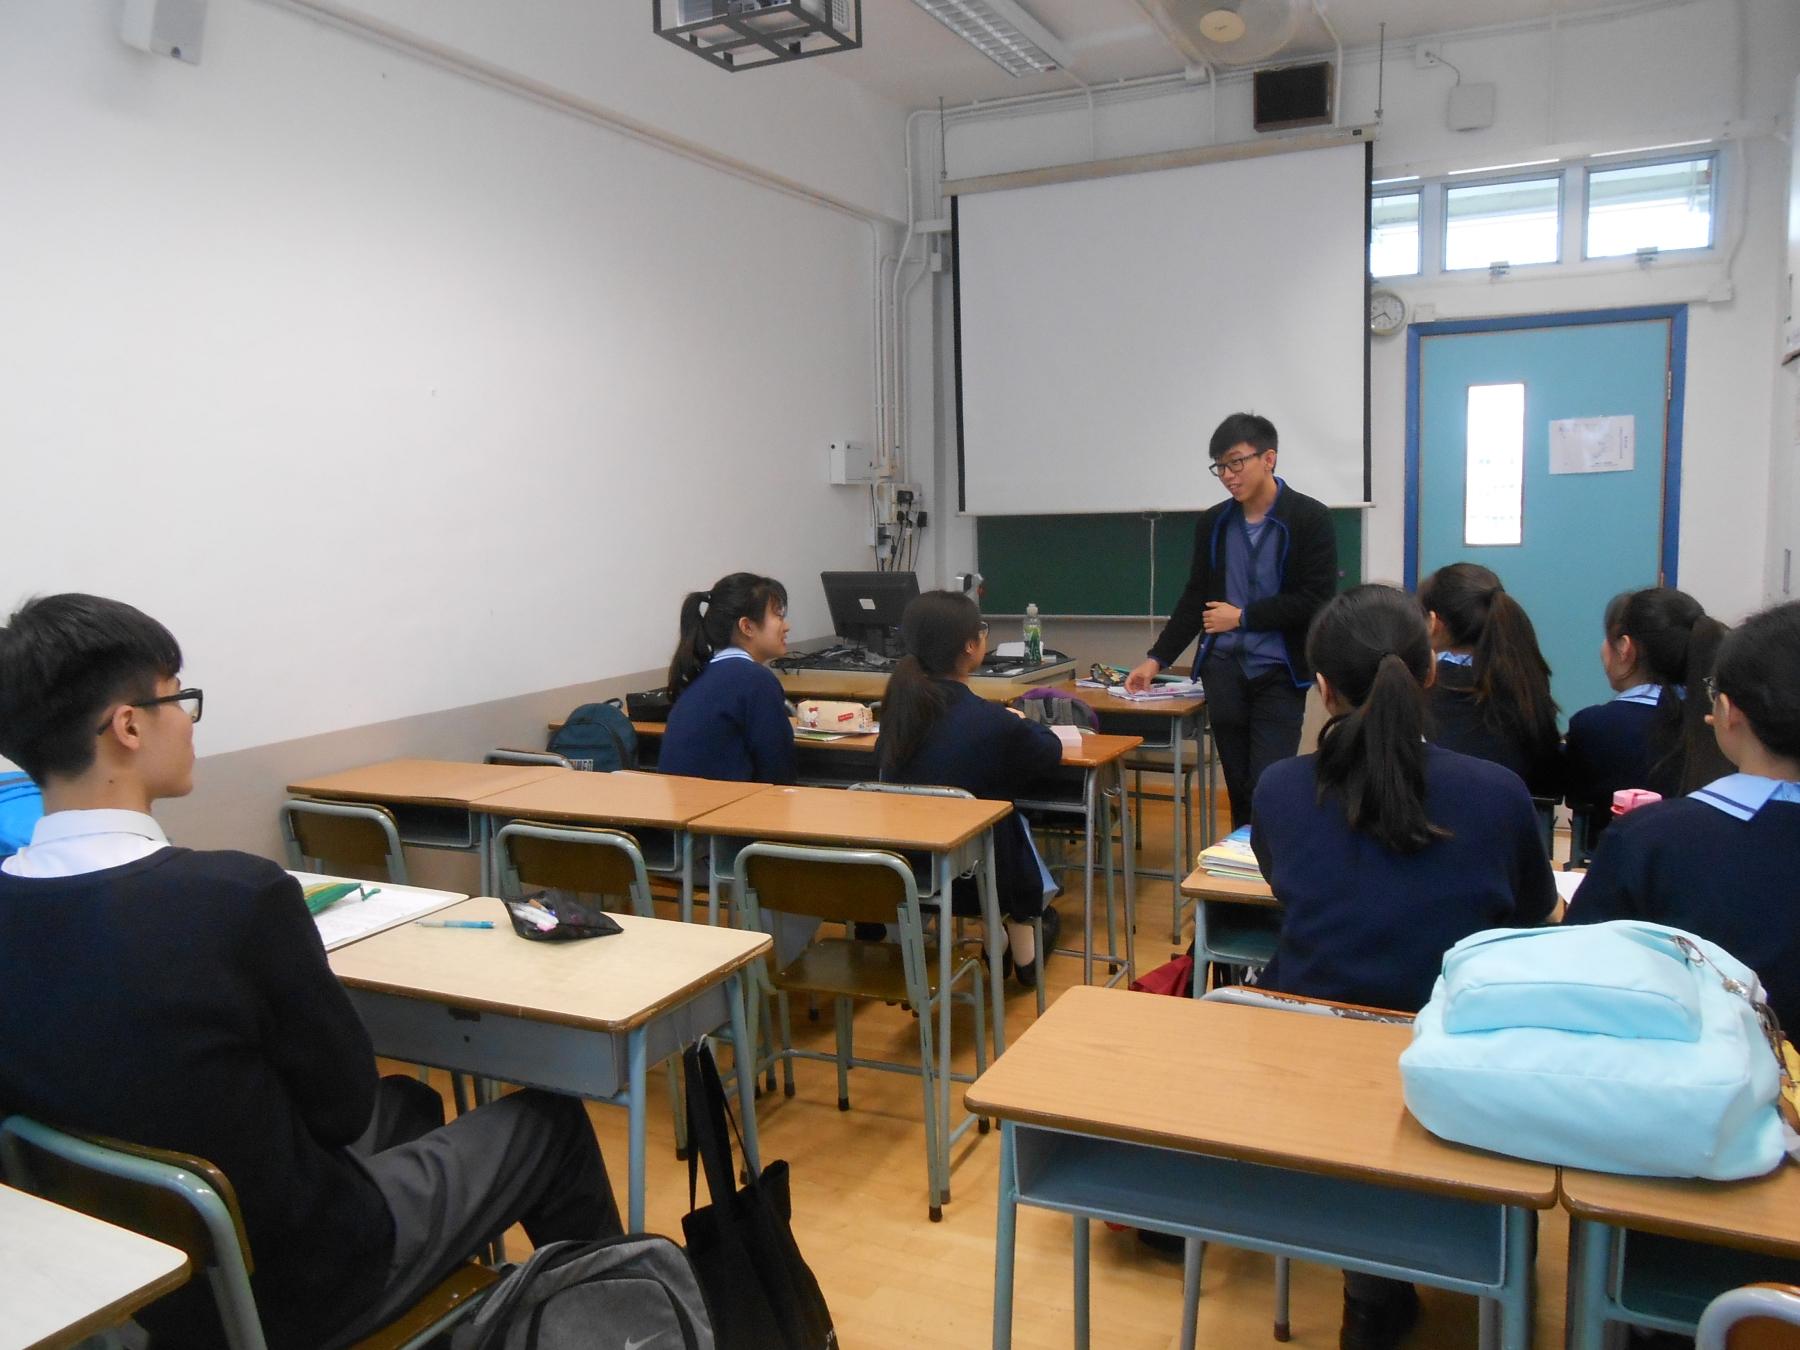 http://npc.edu.hk/sites/default/files/dscn9851.jpg